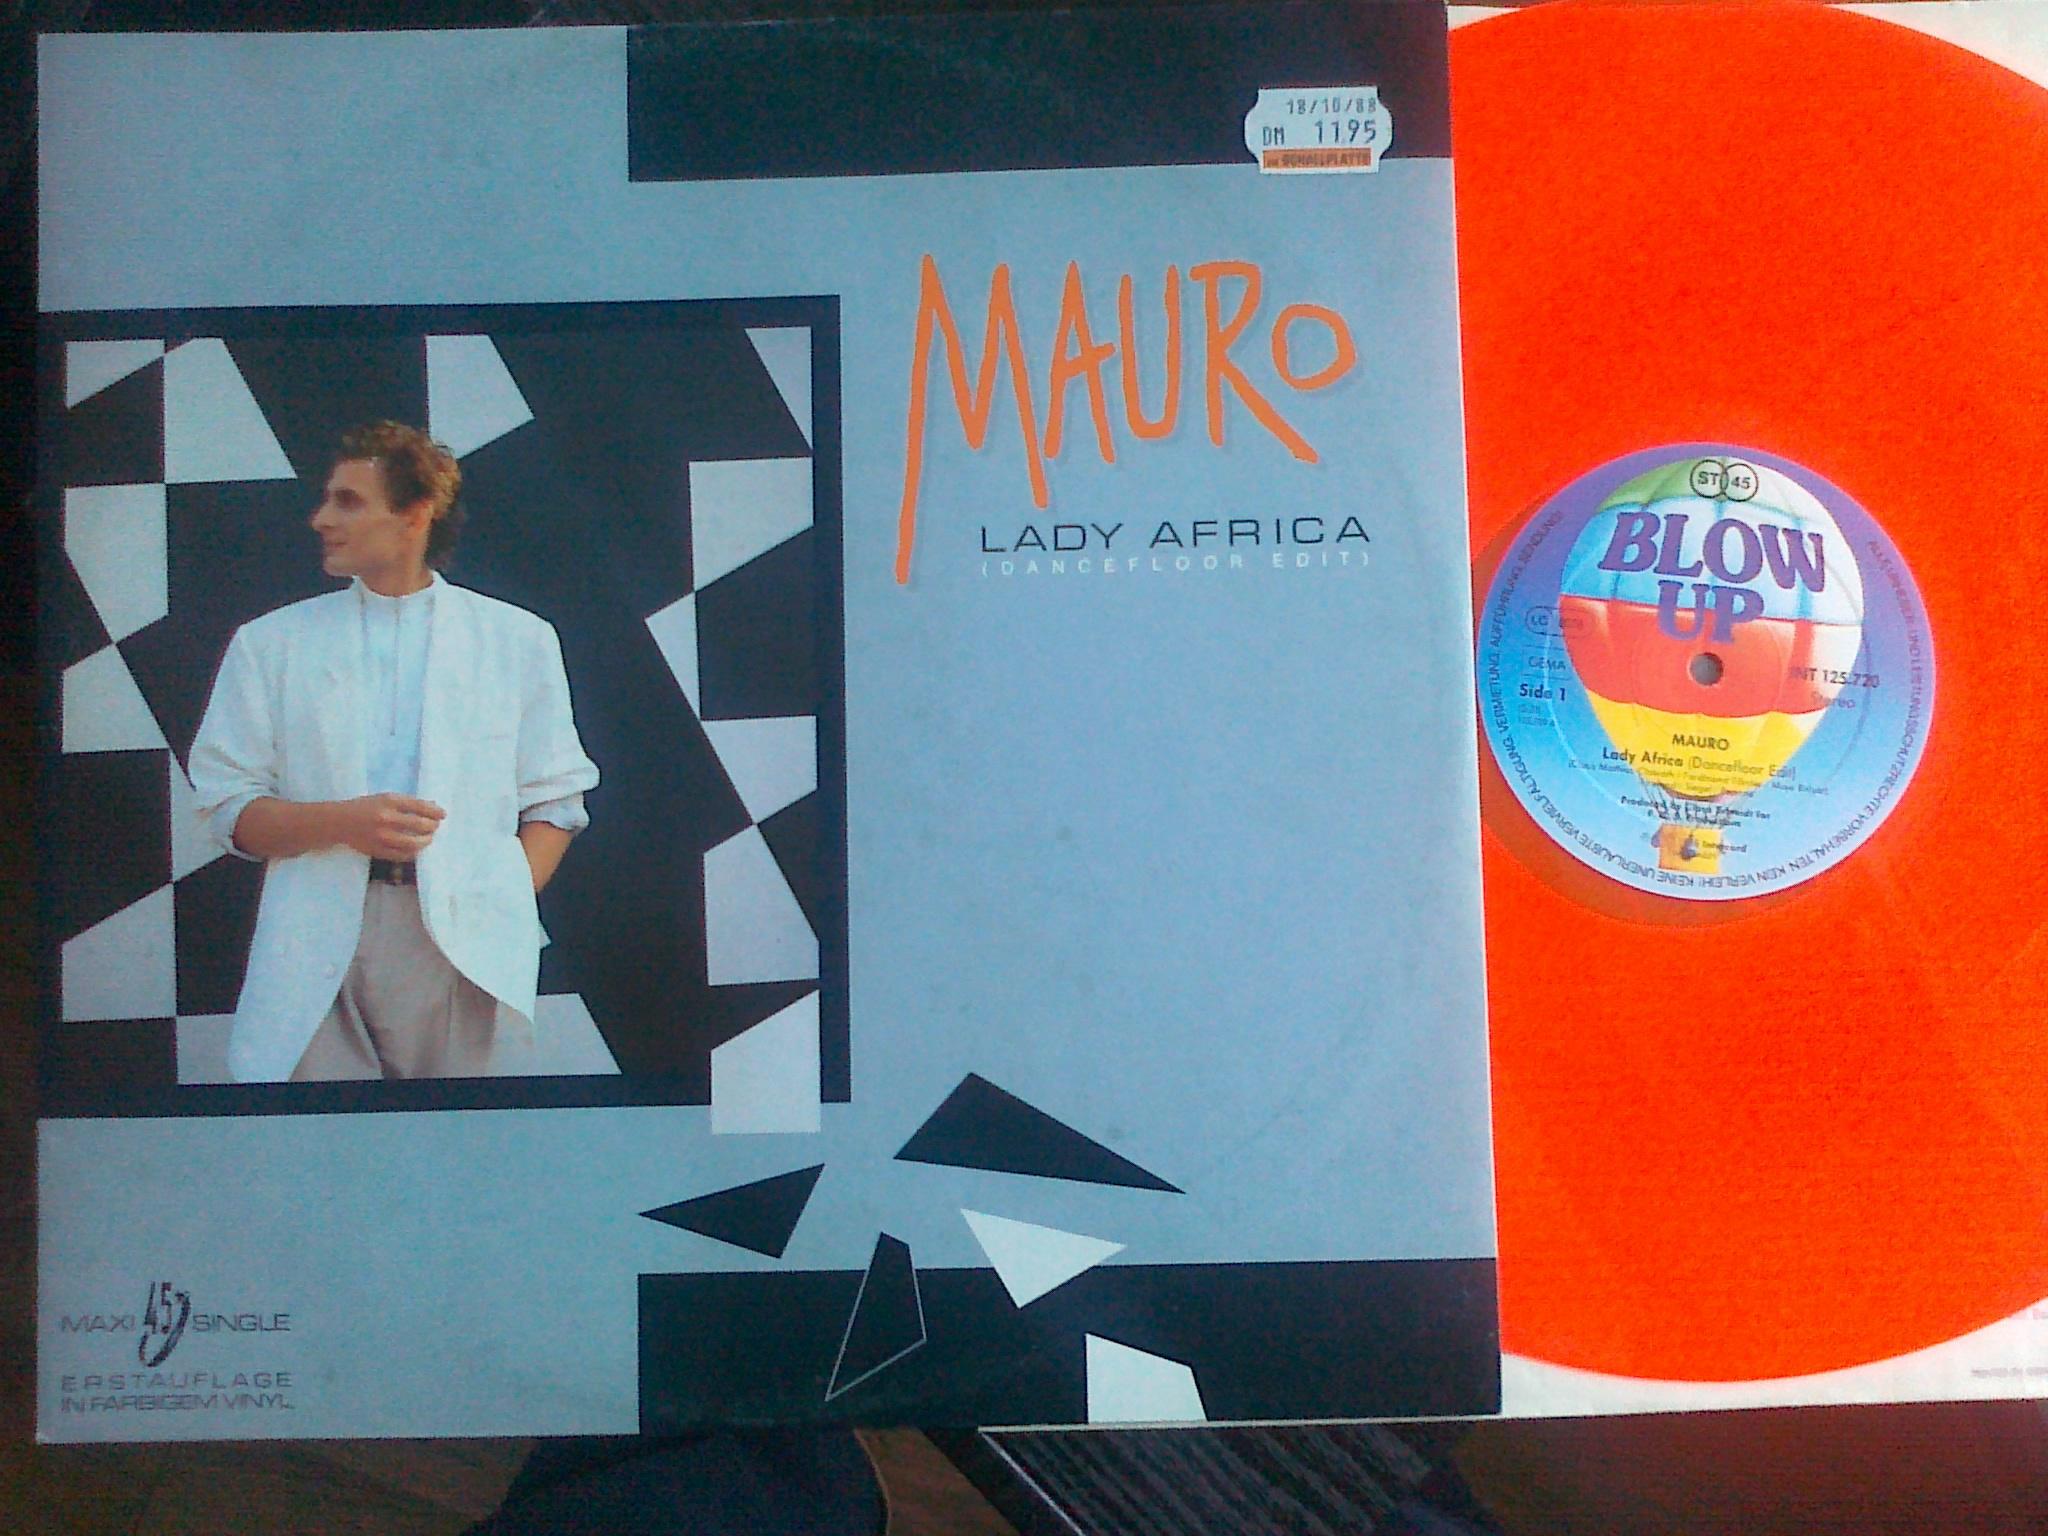 Mauro - Lady Africa